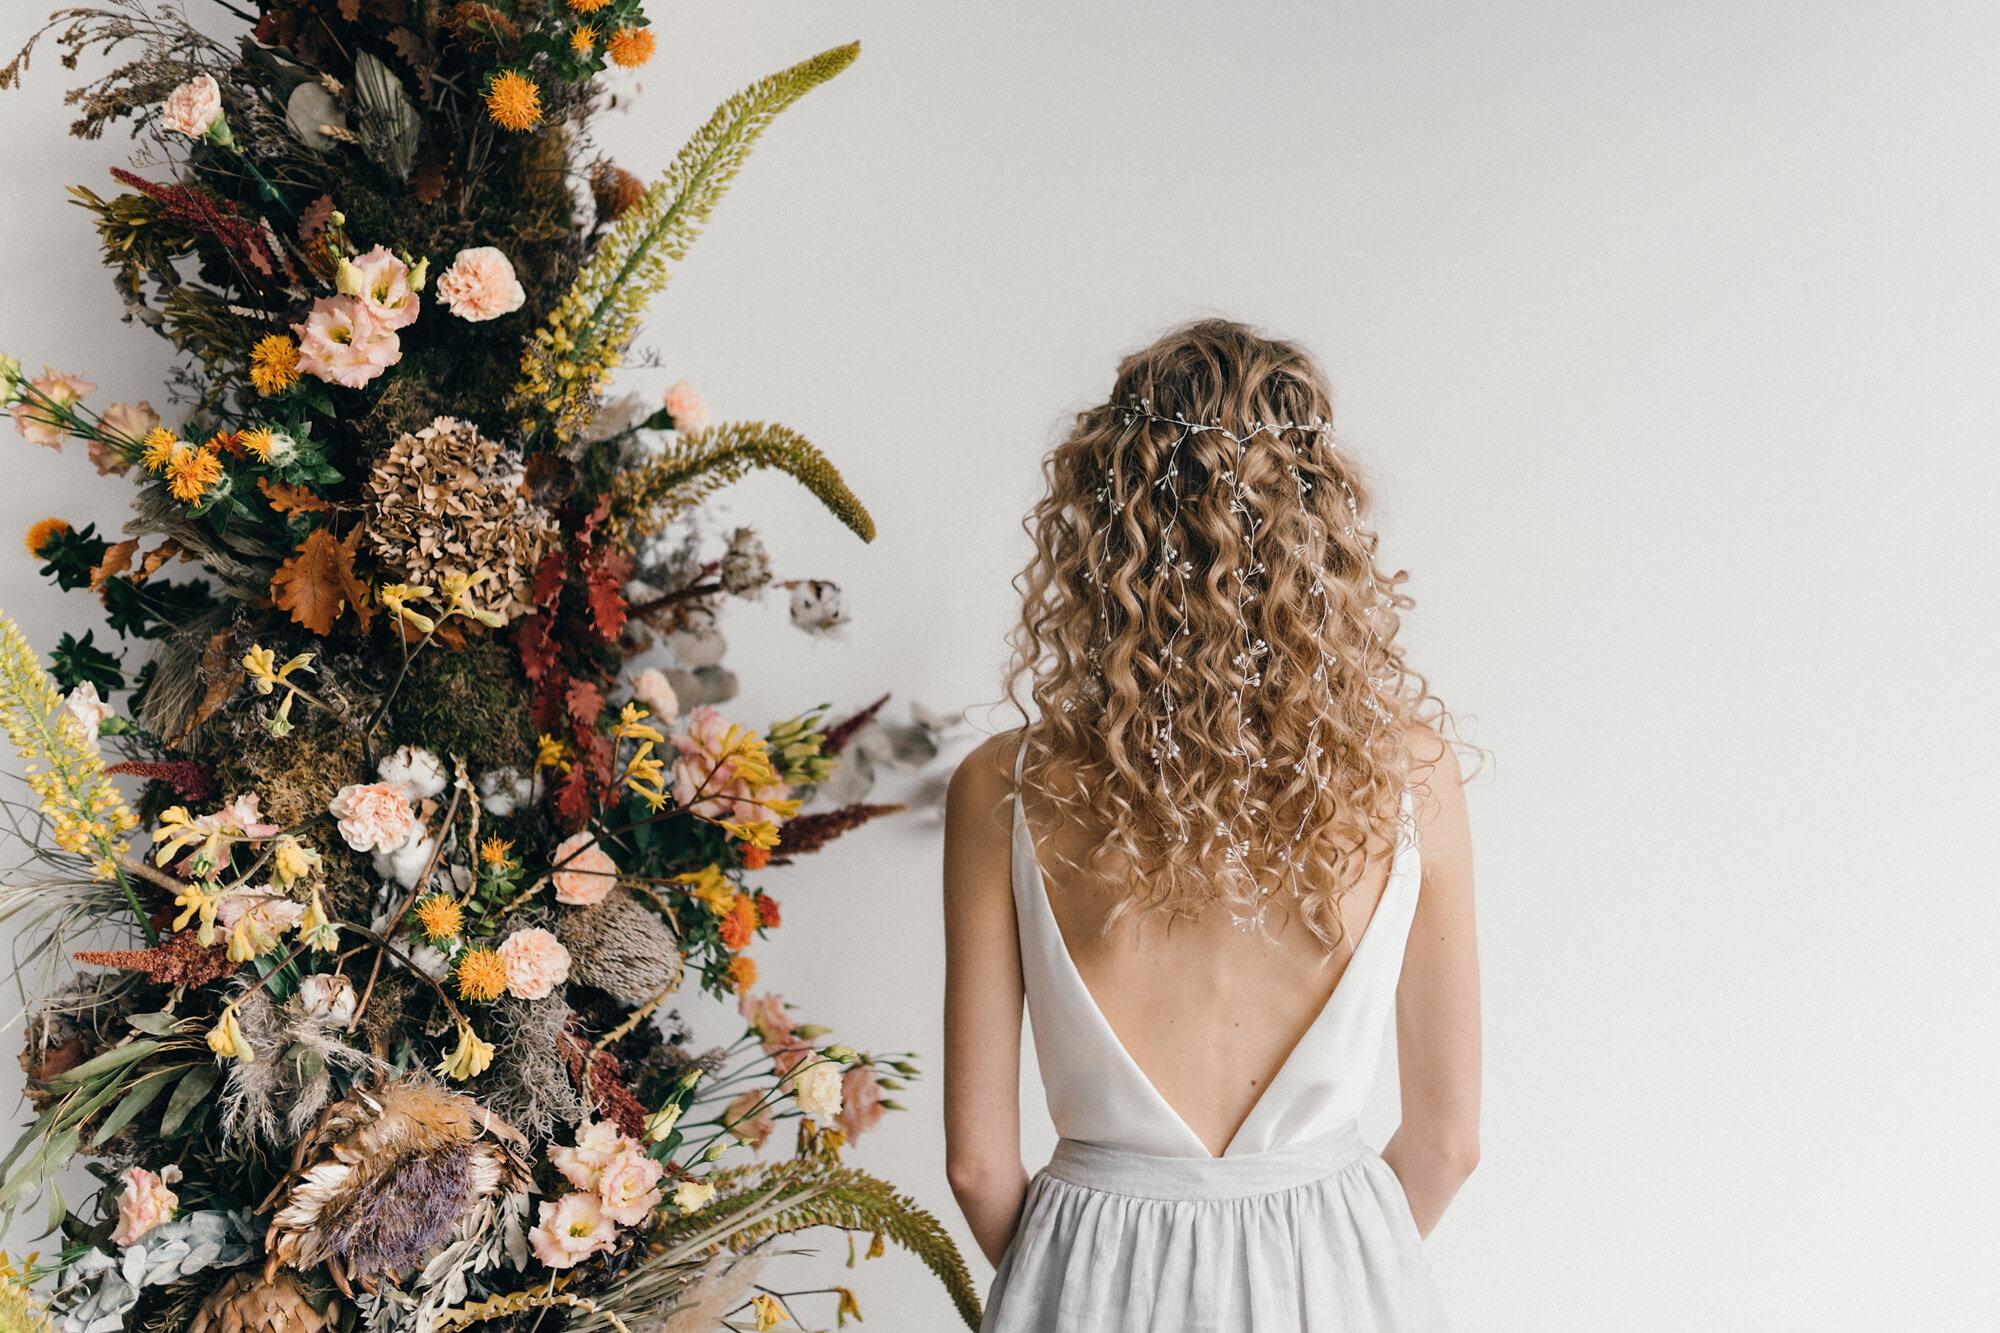 Debbie-Carlisle-Bridal-Accessories-Kate-Beaumont-Wedding-Gowns-Sheffield-Yorkshire-UK-19.jpg